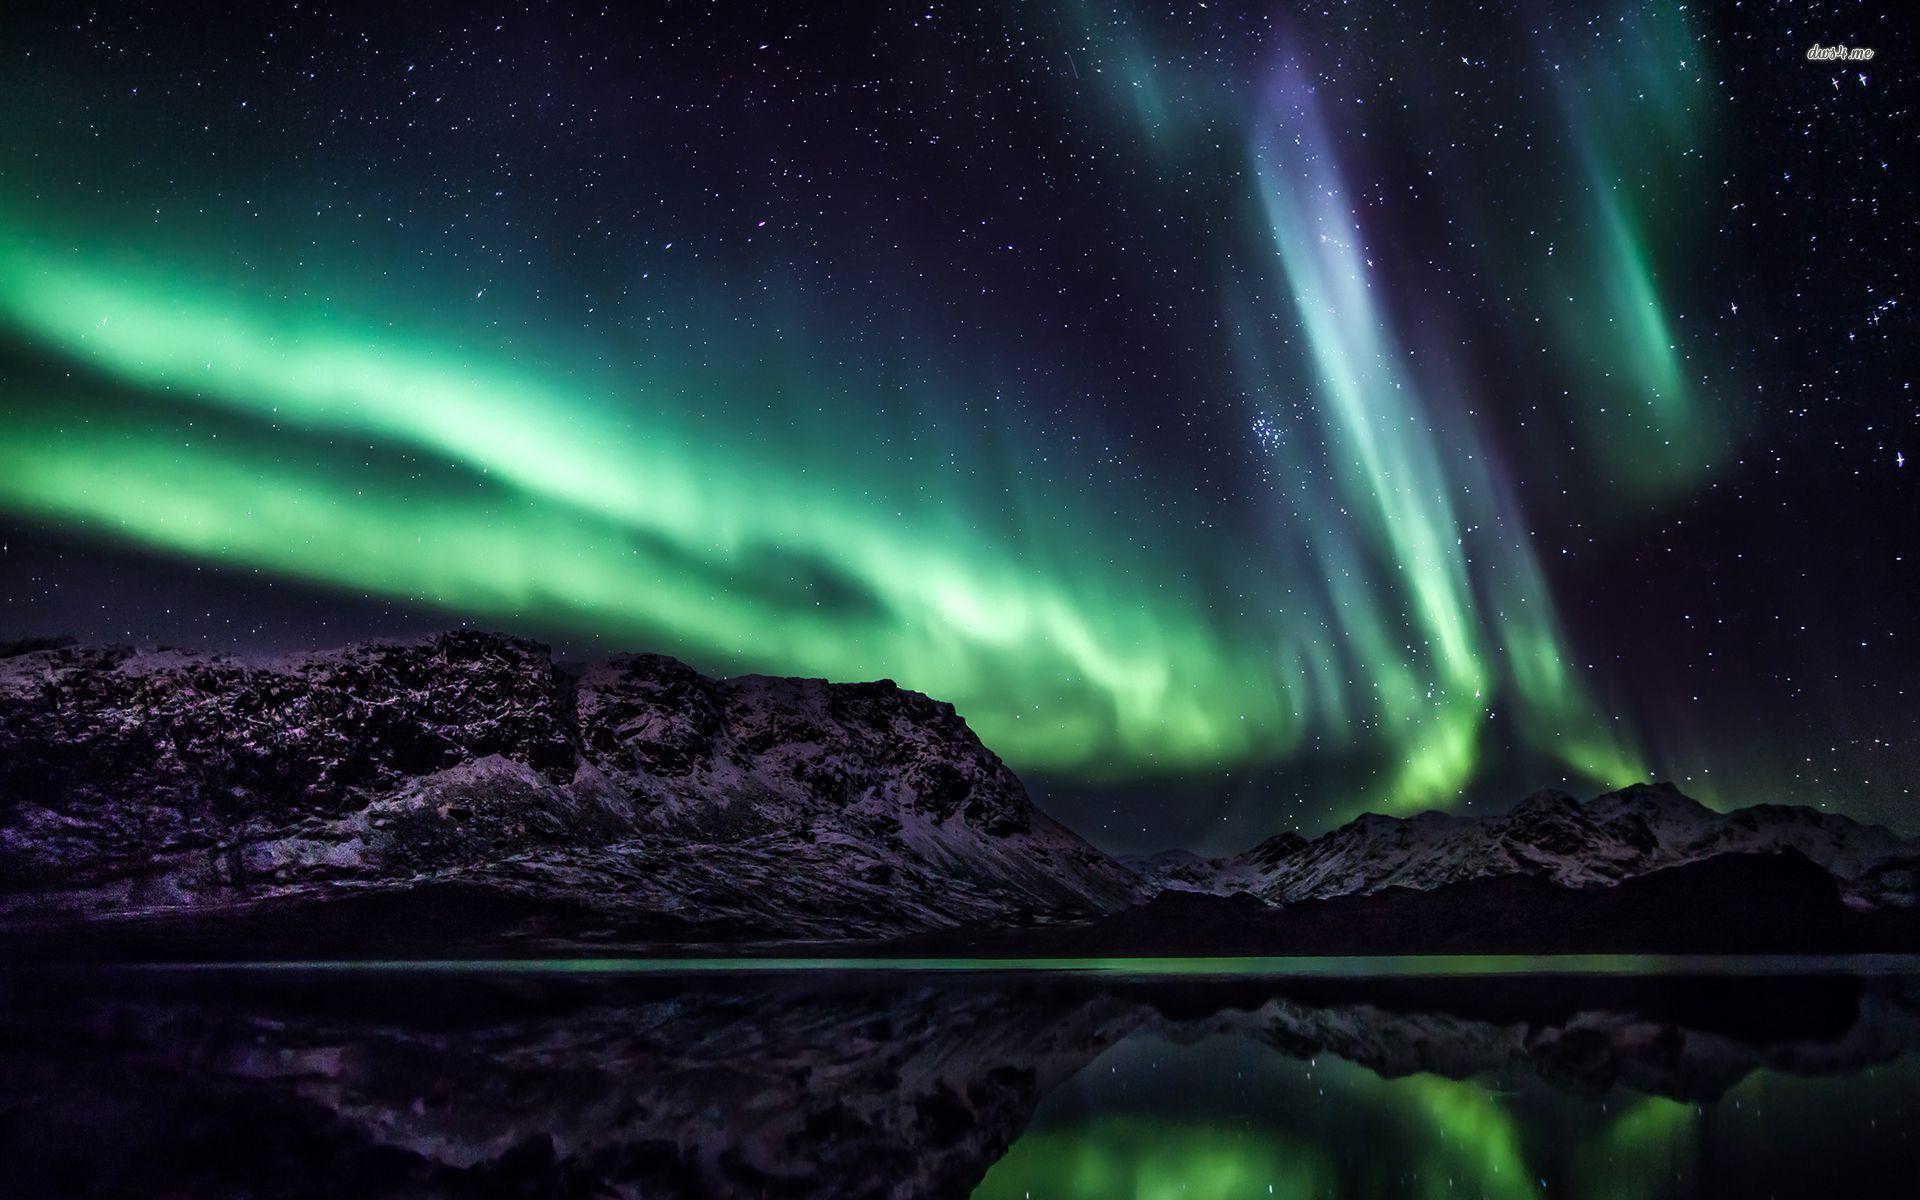 aurora borealis nature - photo #12